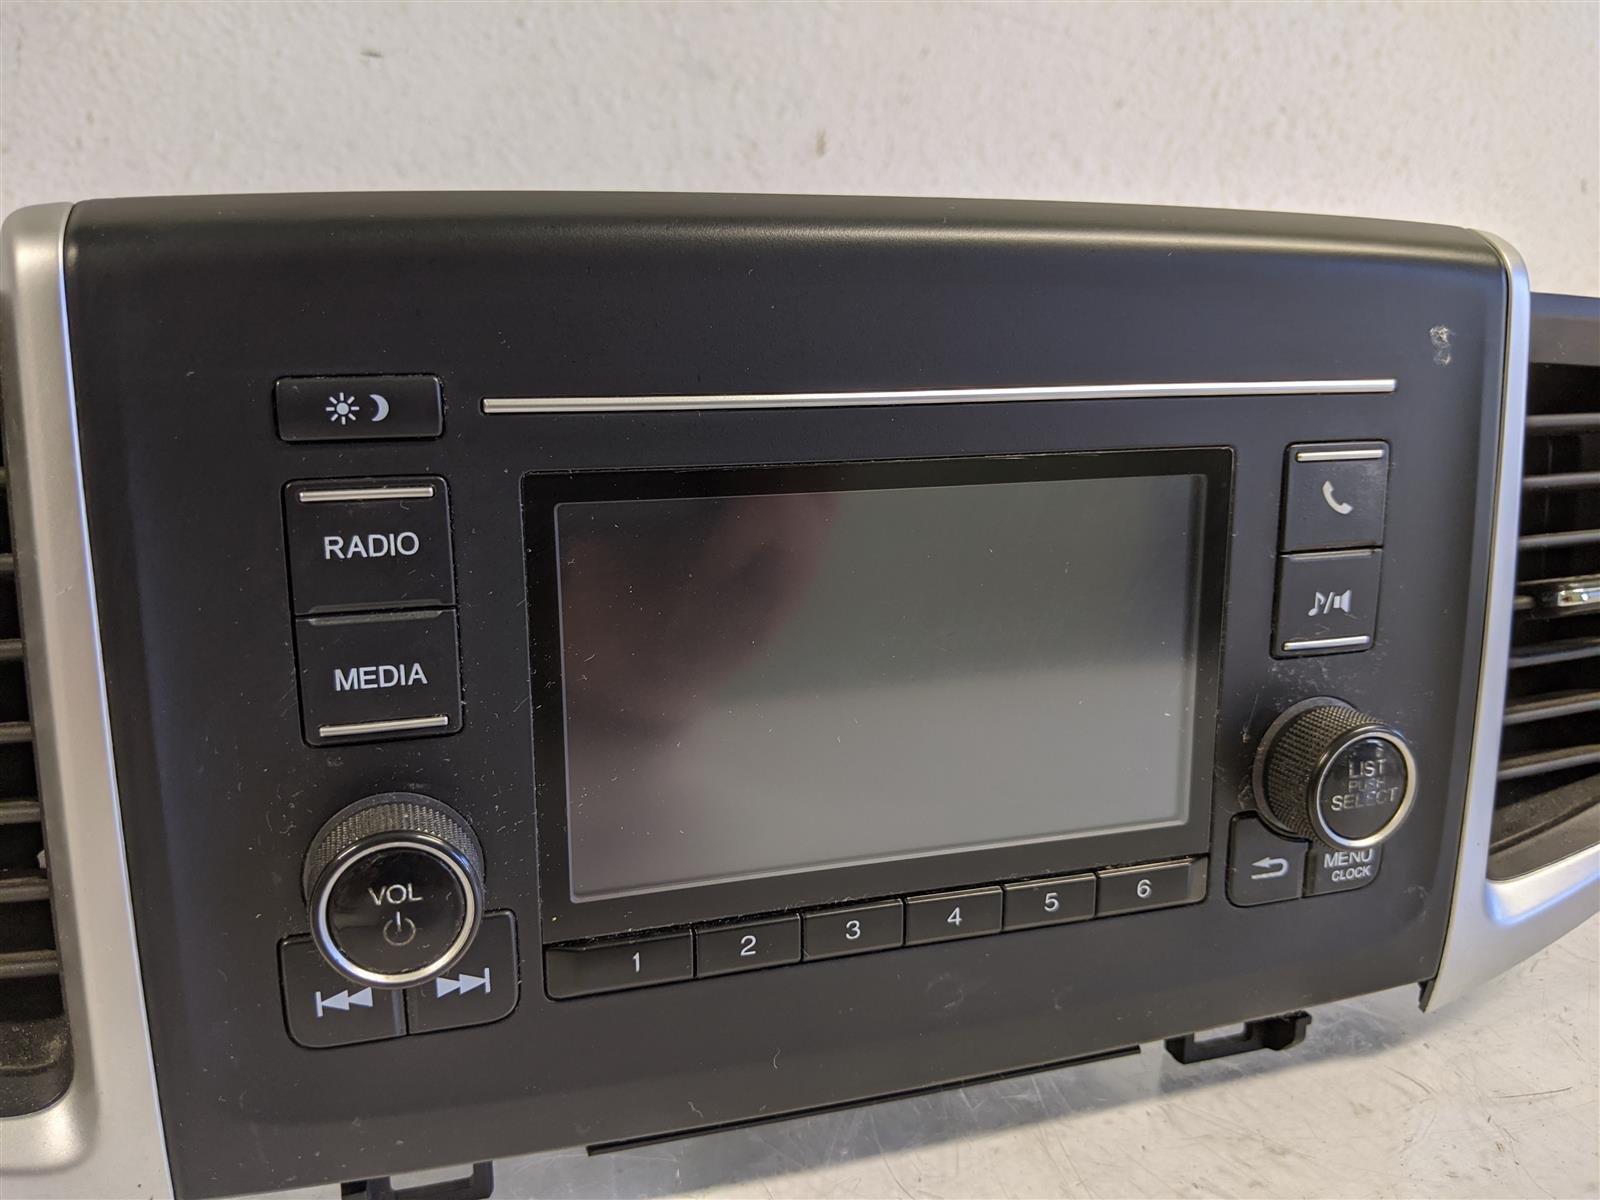 2017 Honda Pilot Lx Am Fm Radio Assembly Replacement